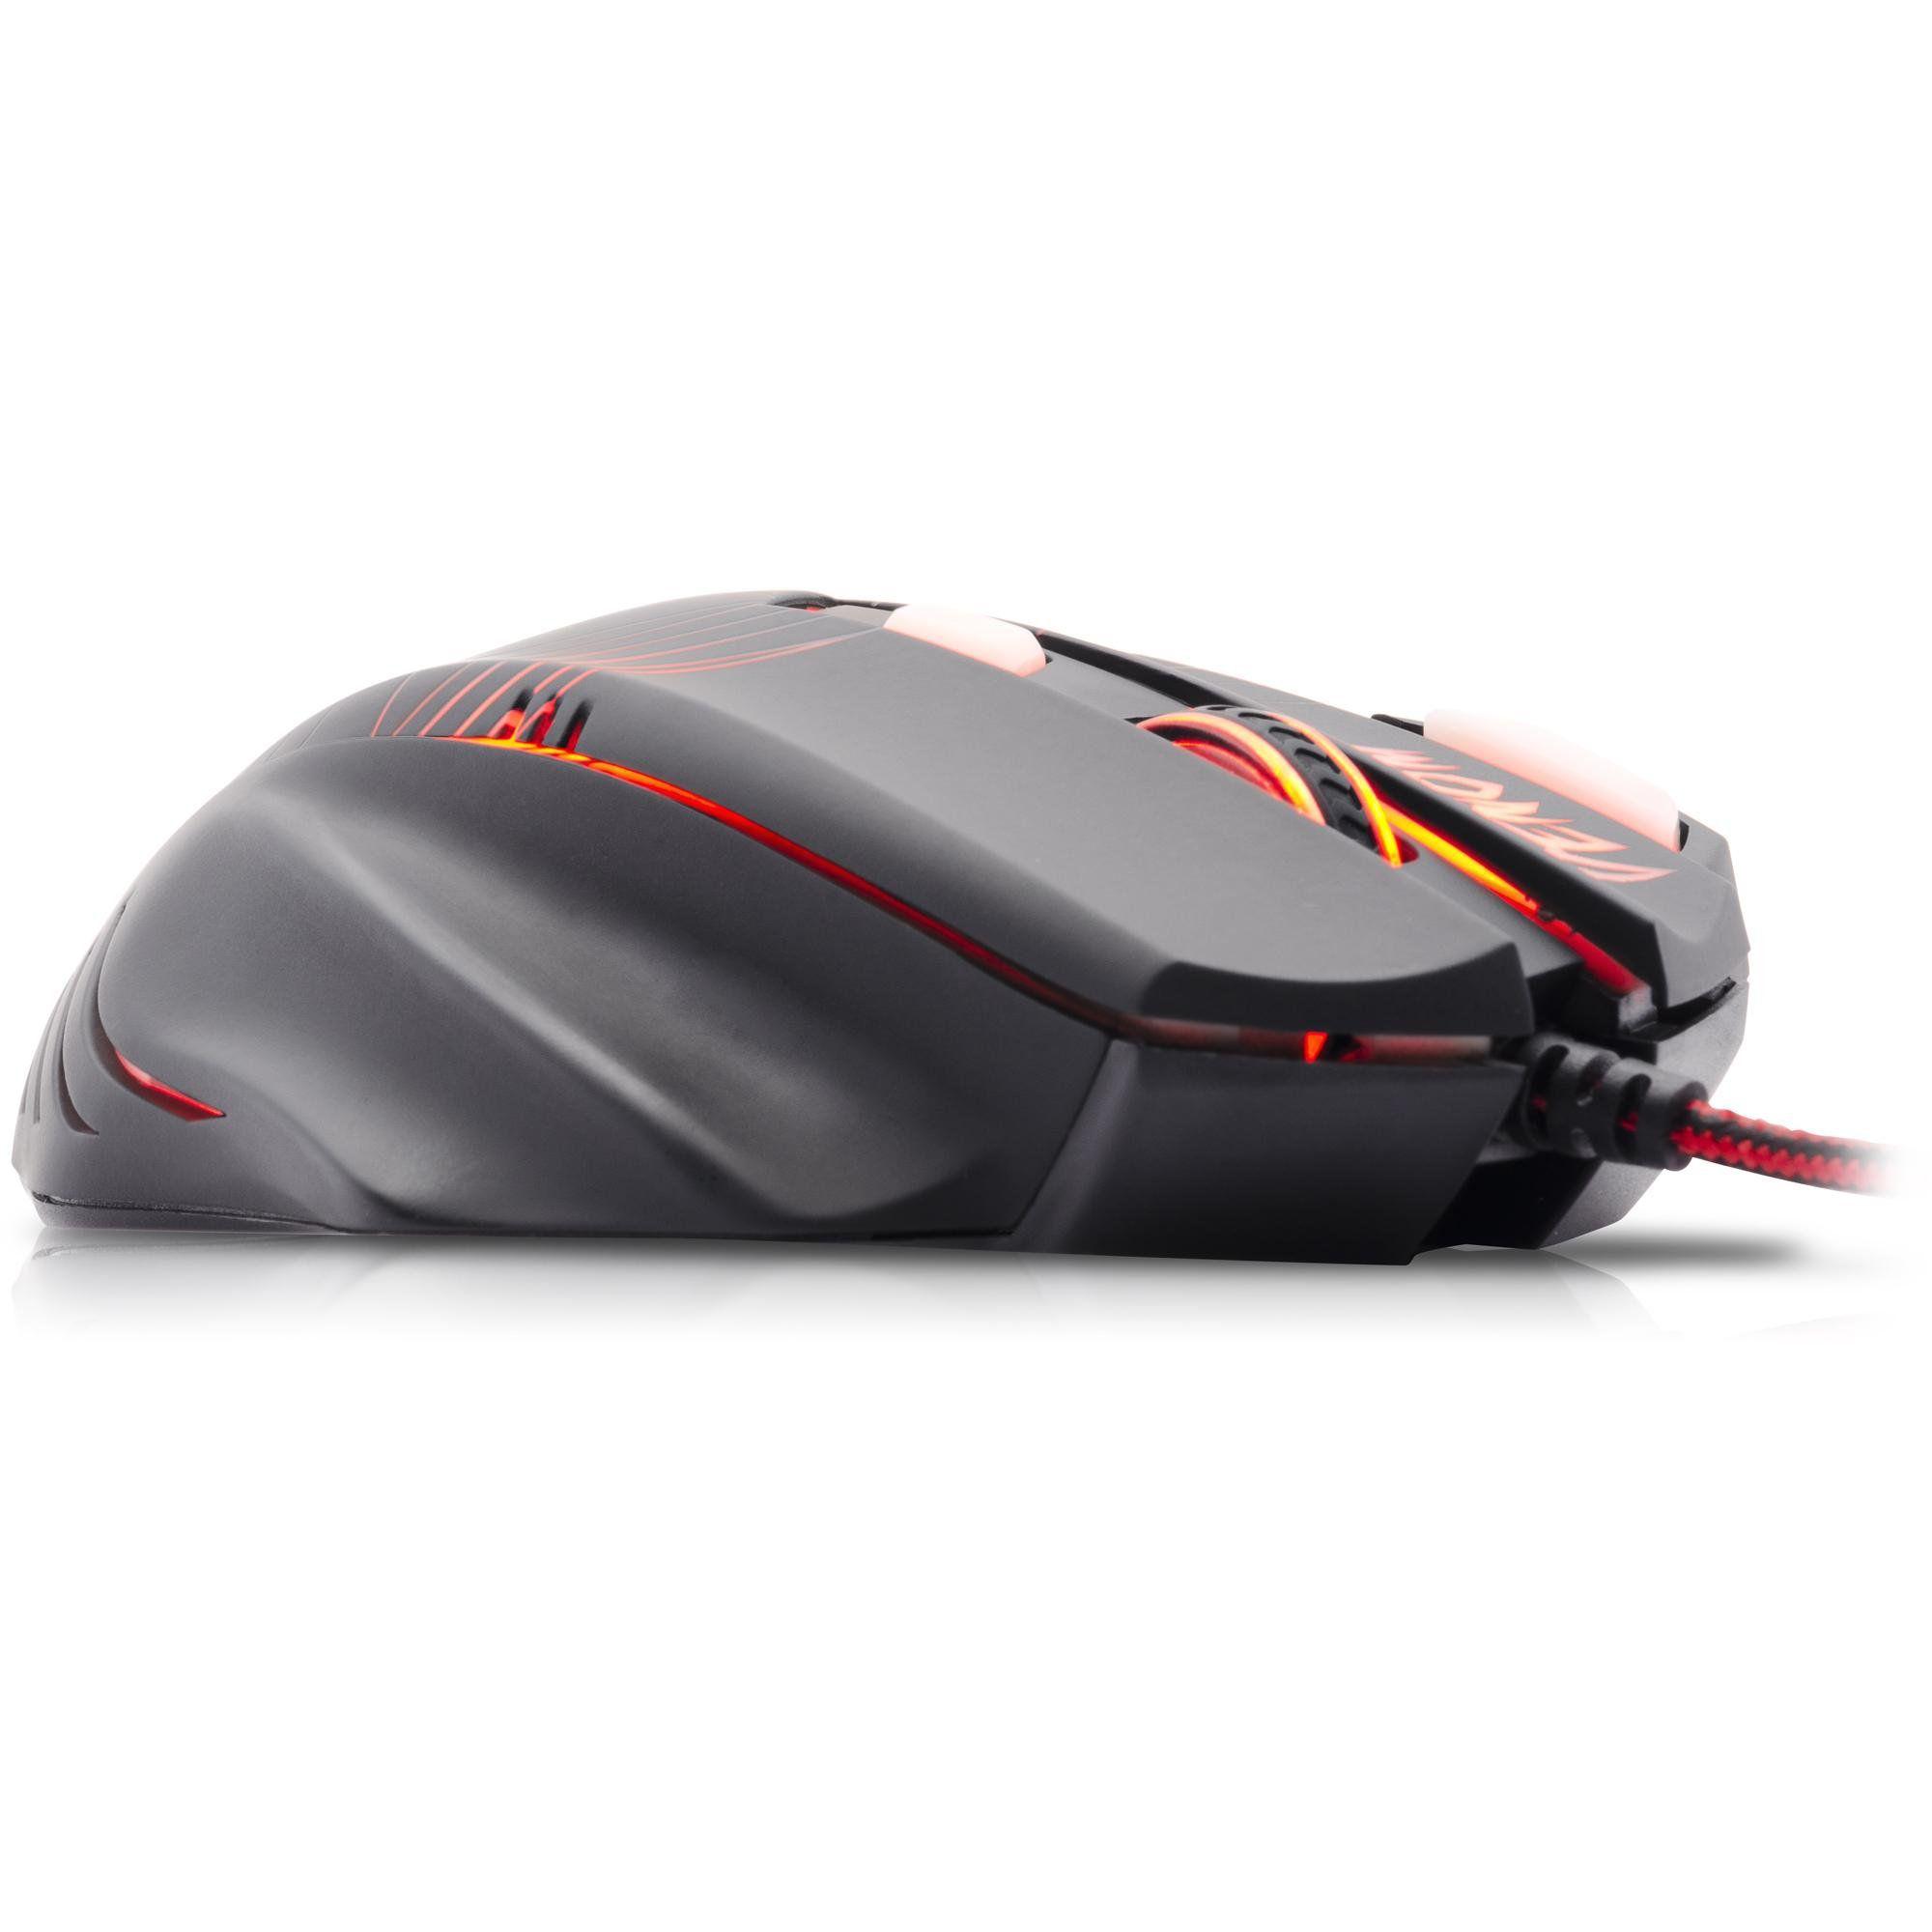 Mouse Gamer Spider Venom OM-704 Sensor Avago Preto/Vermelho FORTREK